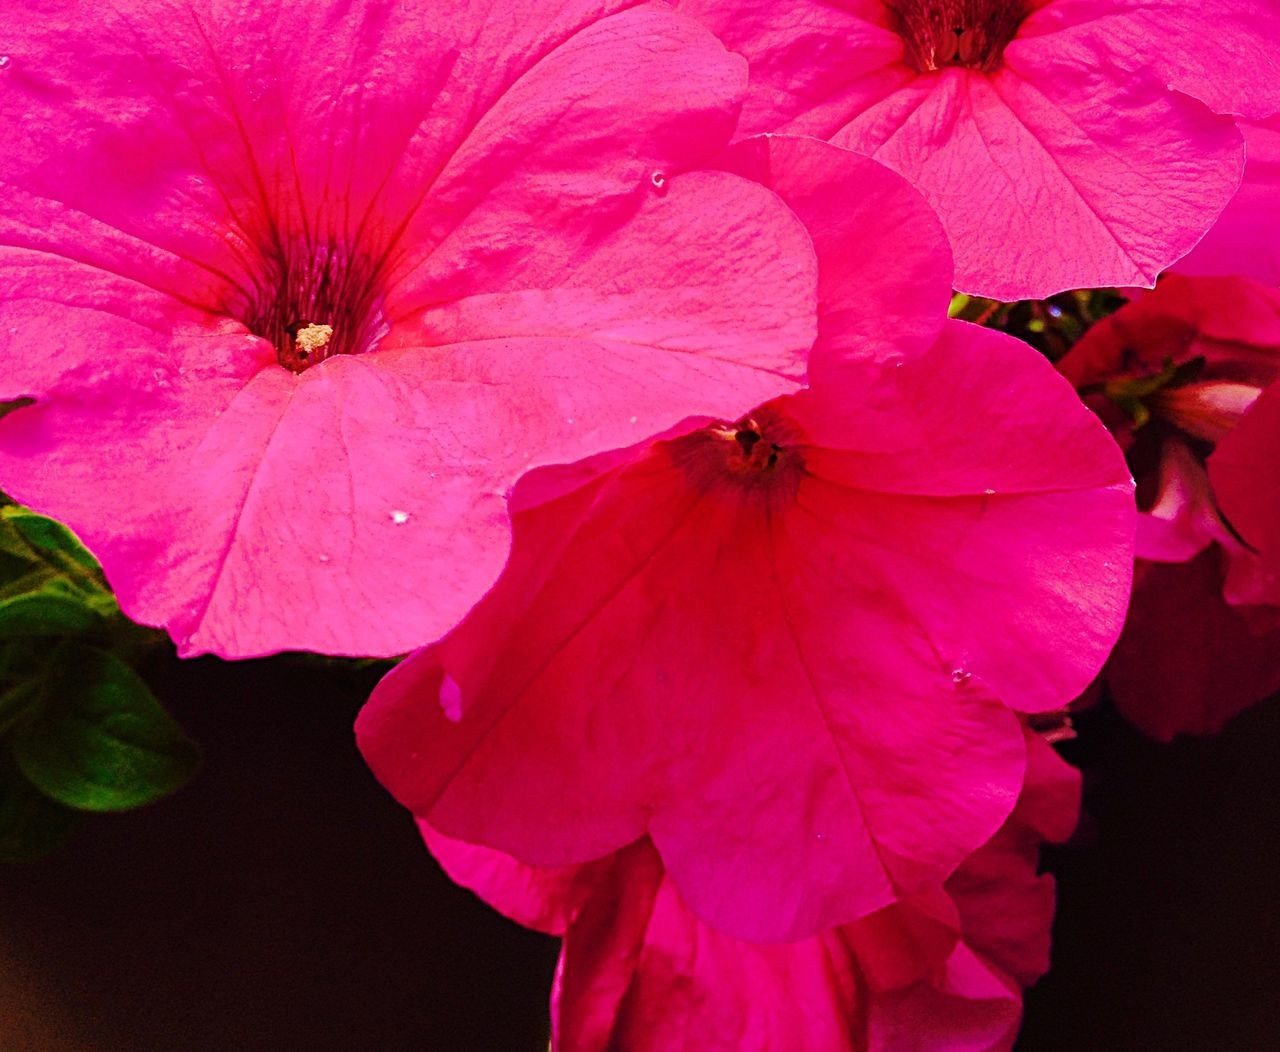 Pink Pansies Pink Pansies Pansies Pink